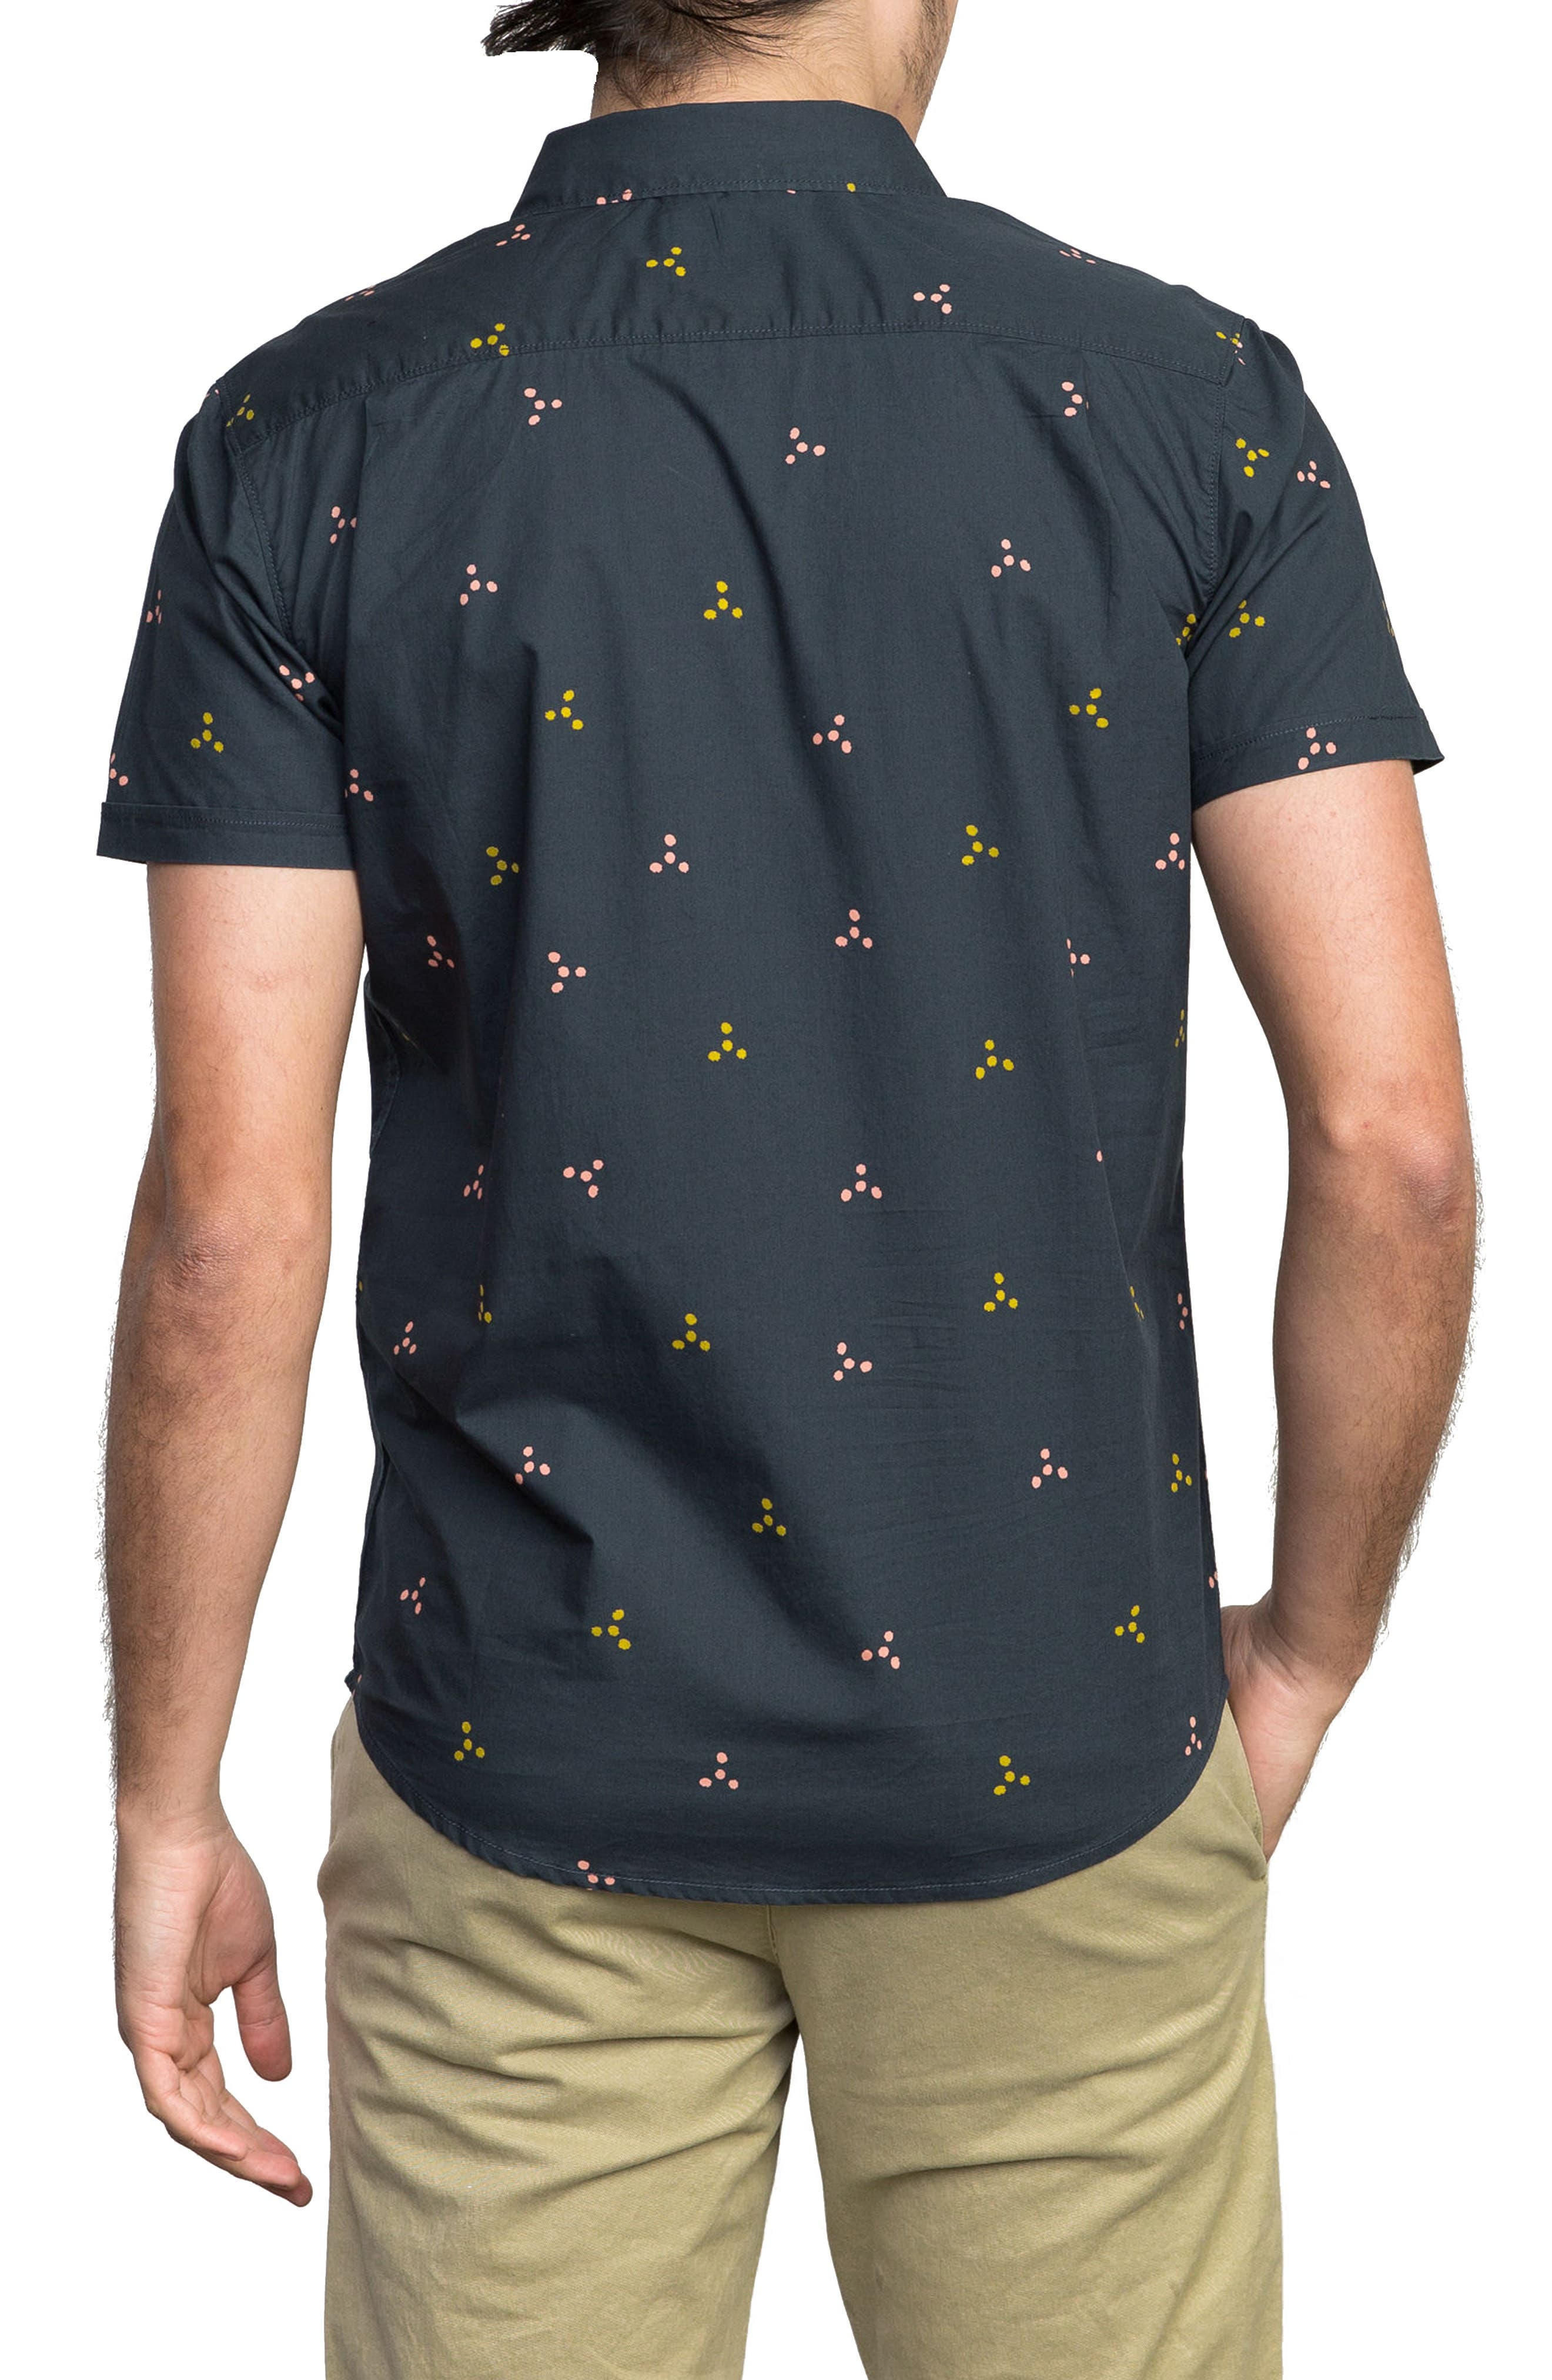 Tridot Woven Shirt,                             Alternate thumbnail 2, color,                             020